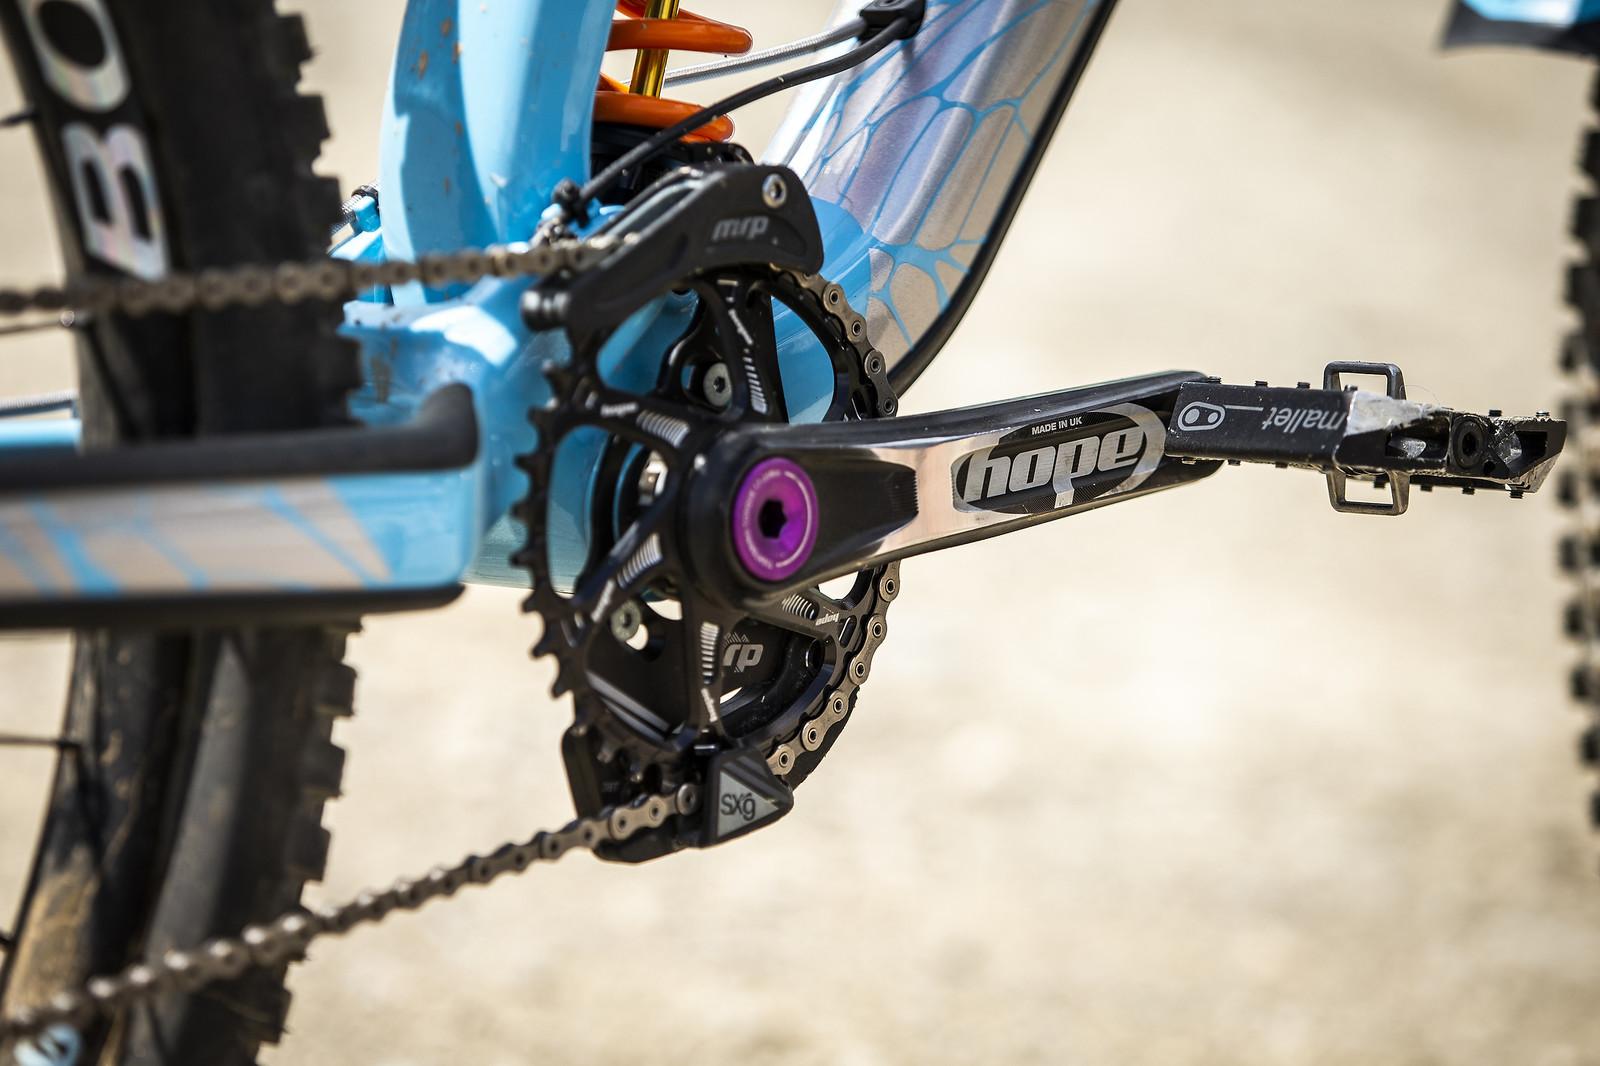 Hope Cranks and Chainring with MRP Chainguide - WINNING BIKE - Rachel Atherton's Trek Session - Mountain Biking Pictures - Vital MTB